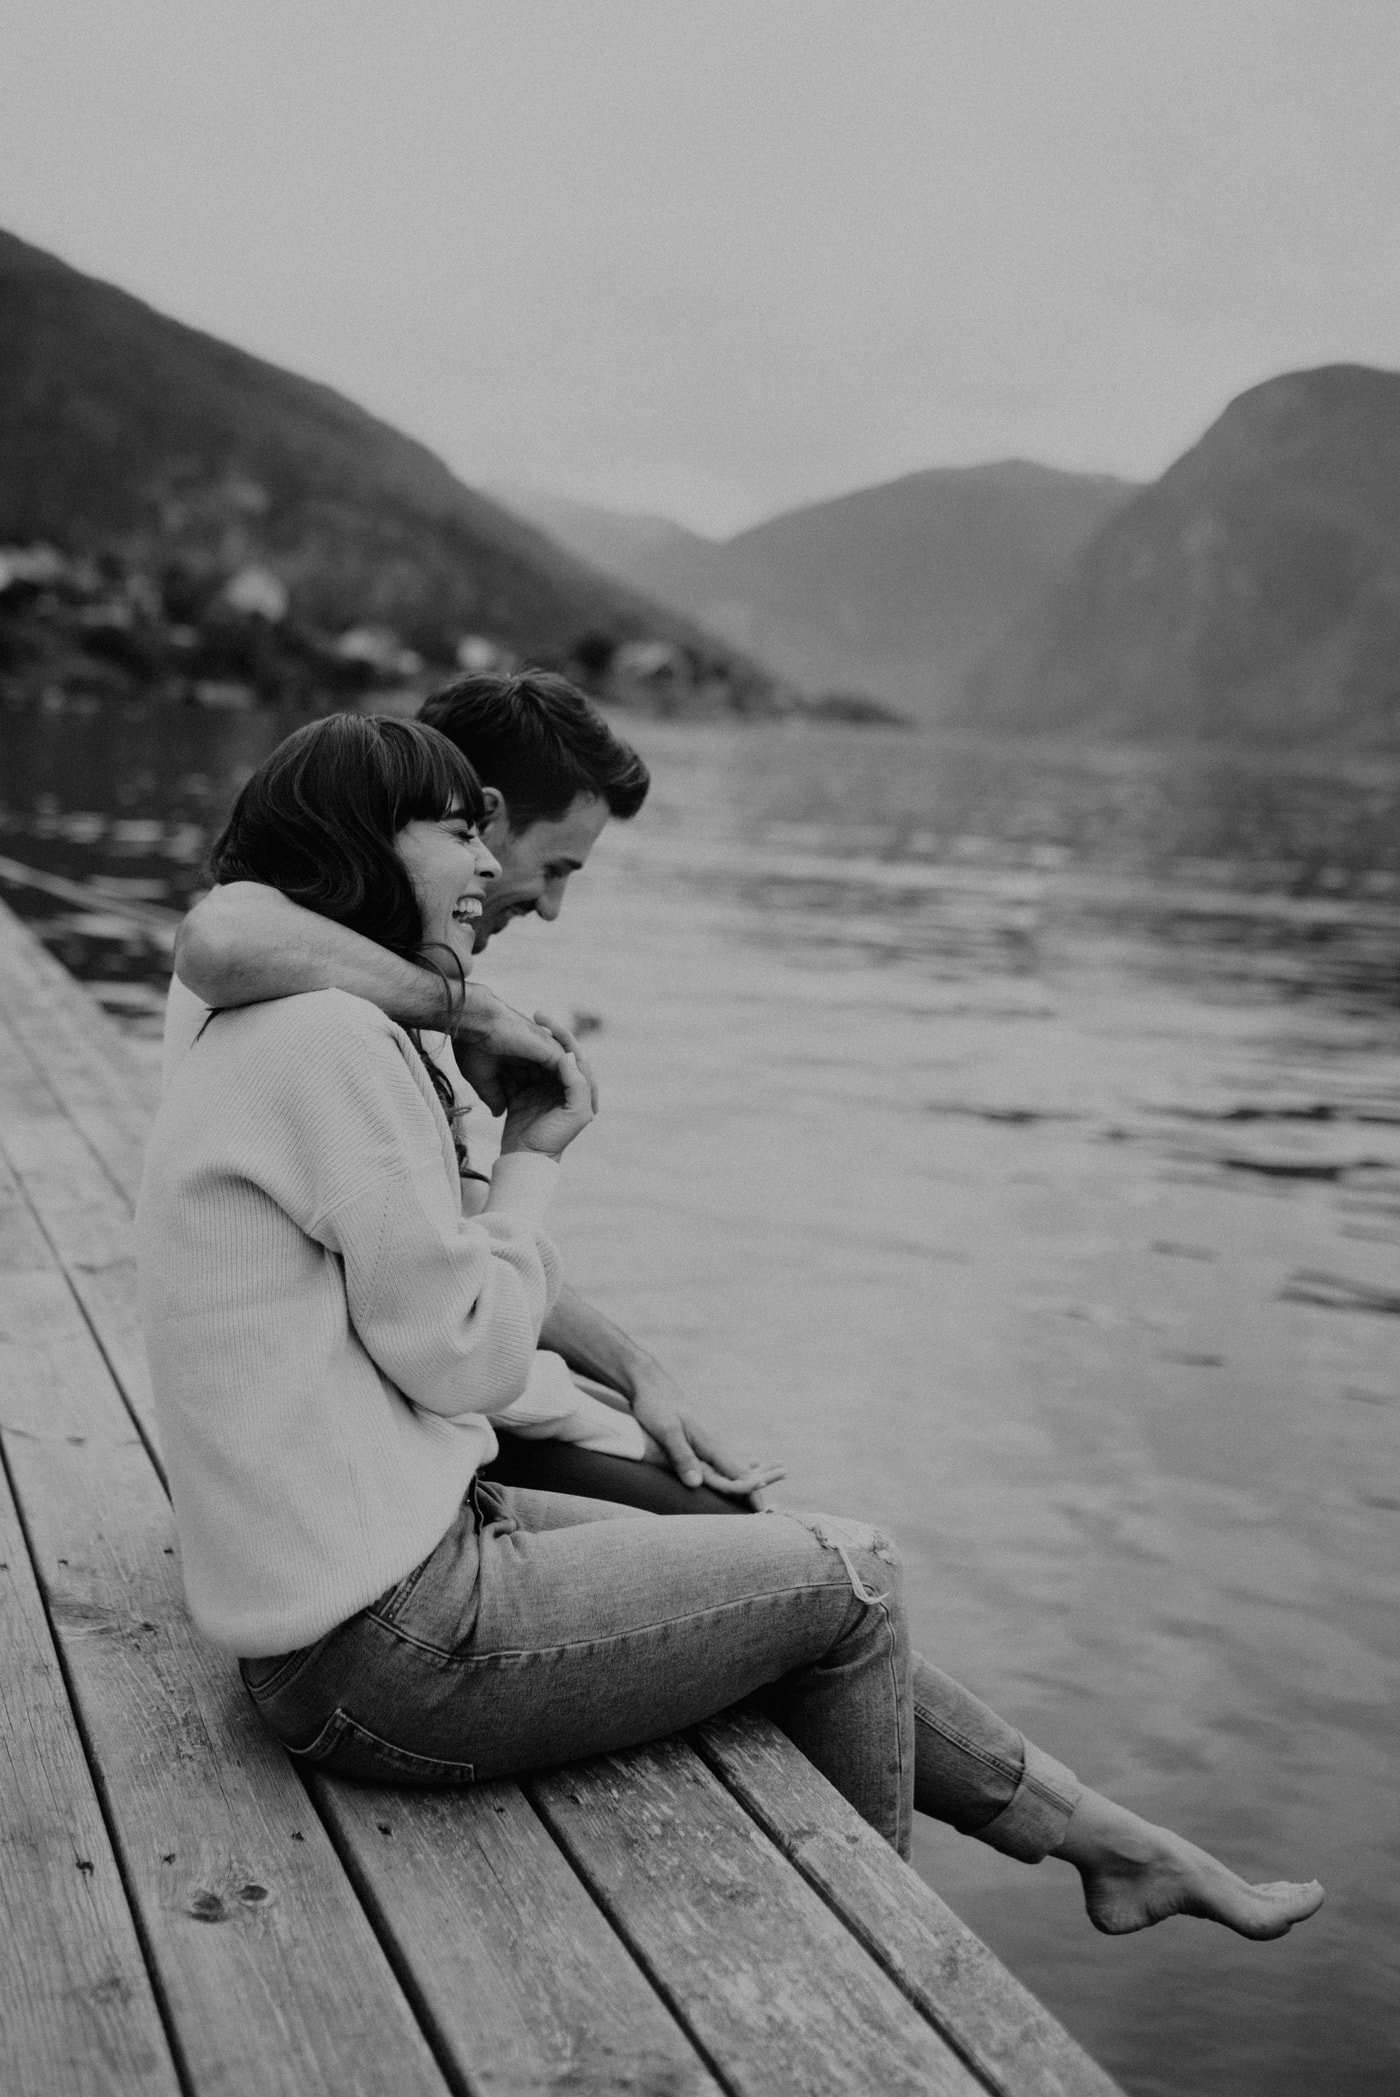 European elopement photographer Emily Kidd